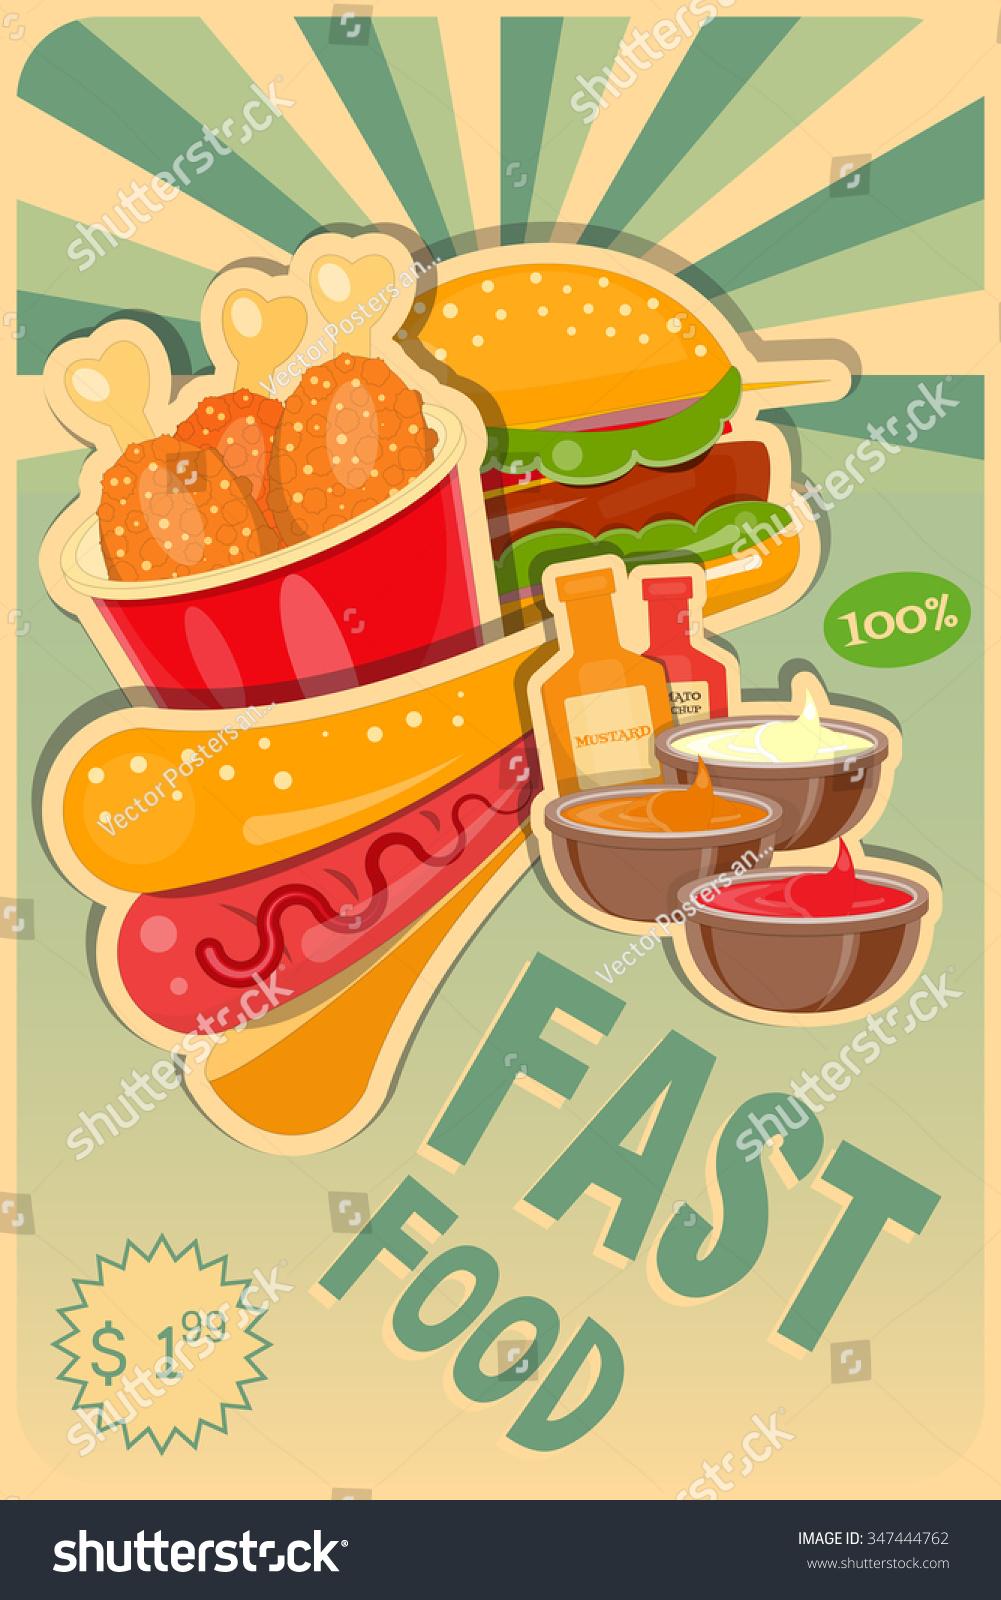 Best Fast Food Website Designs